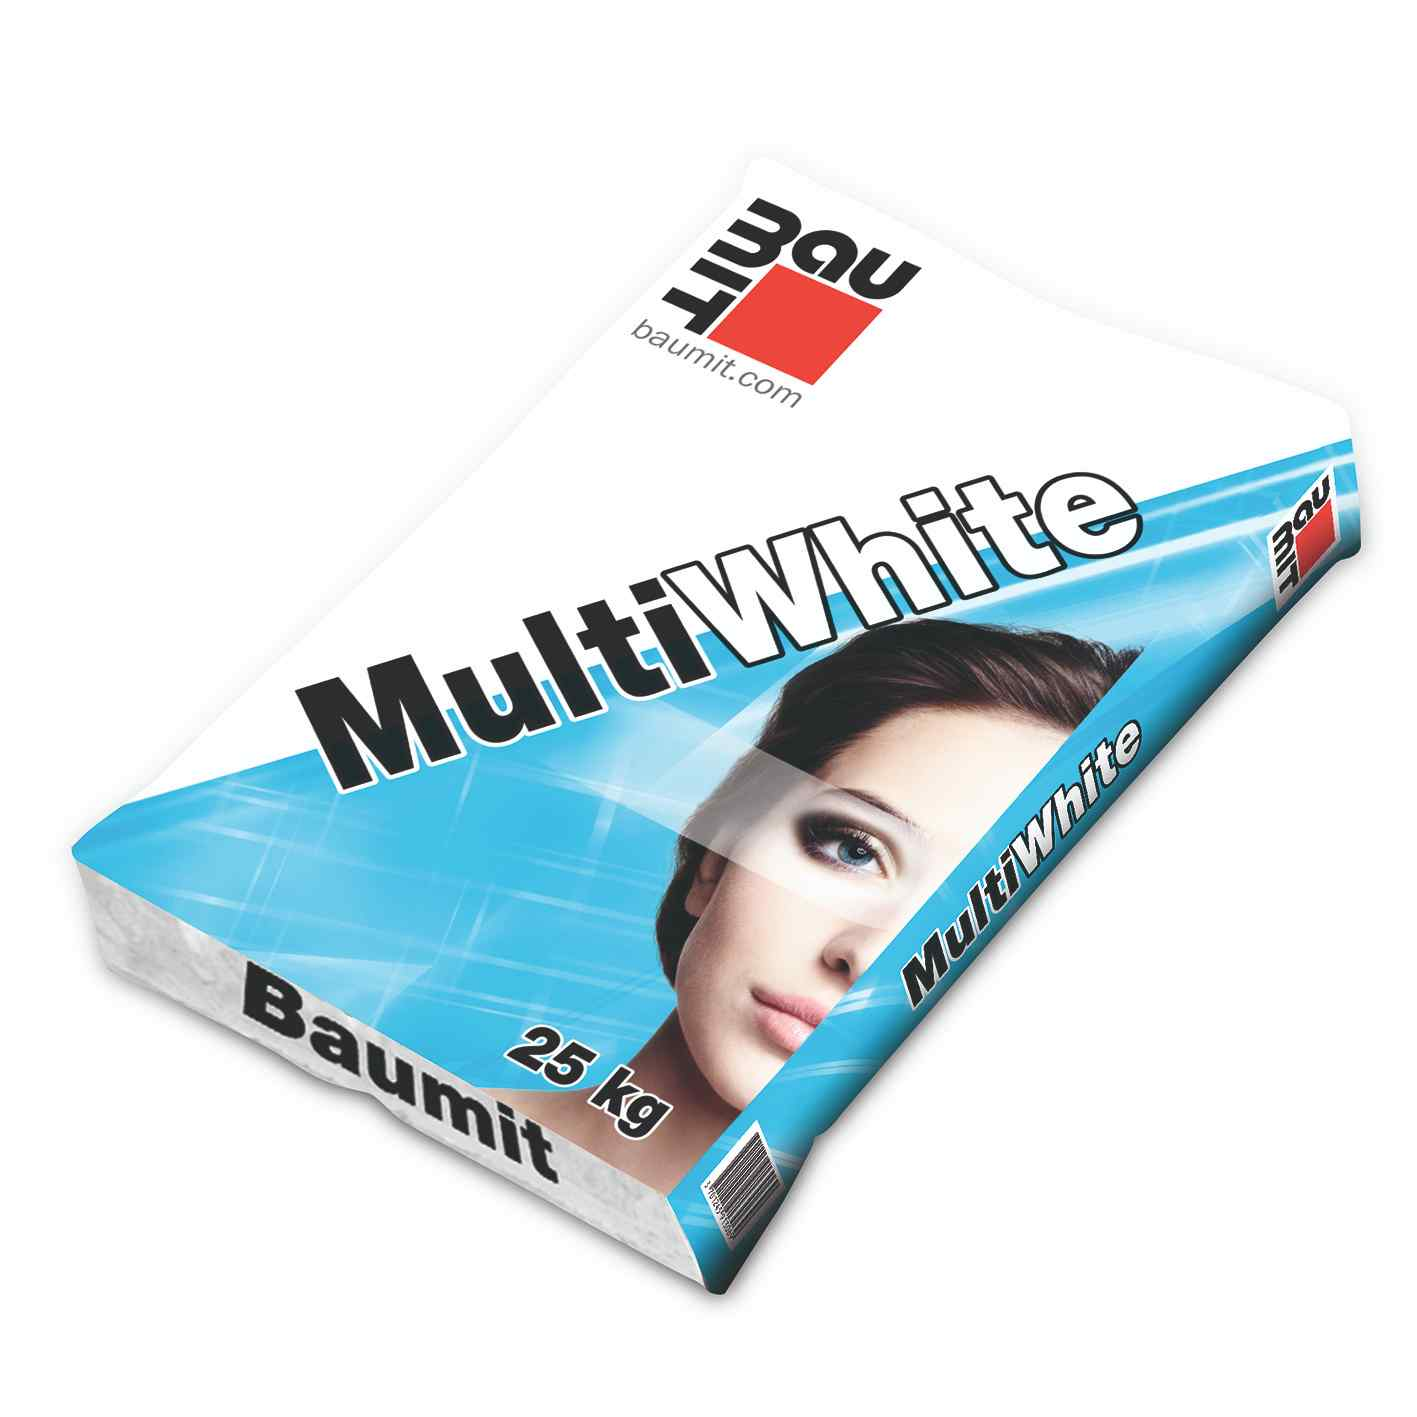 05b4_Baumit_MultiWhite sikmo